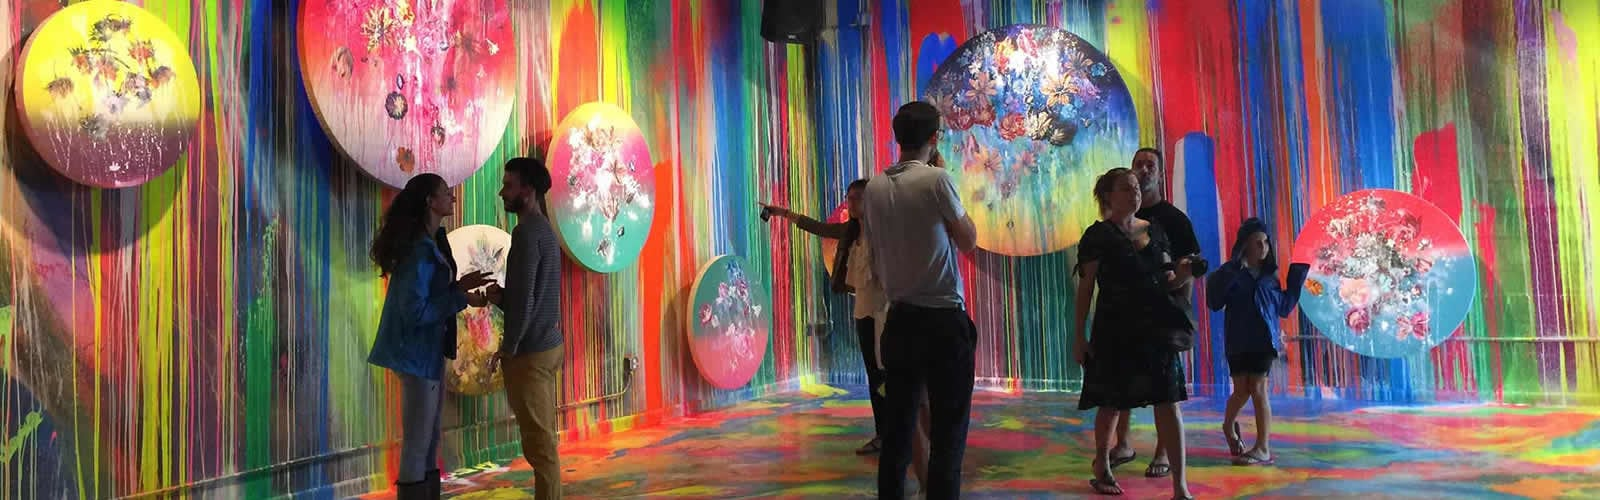 art-walk-wynwood-soiree-culturelle-chaque-mois-miami-une